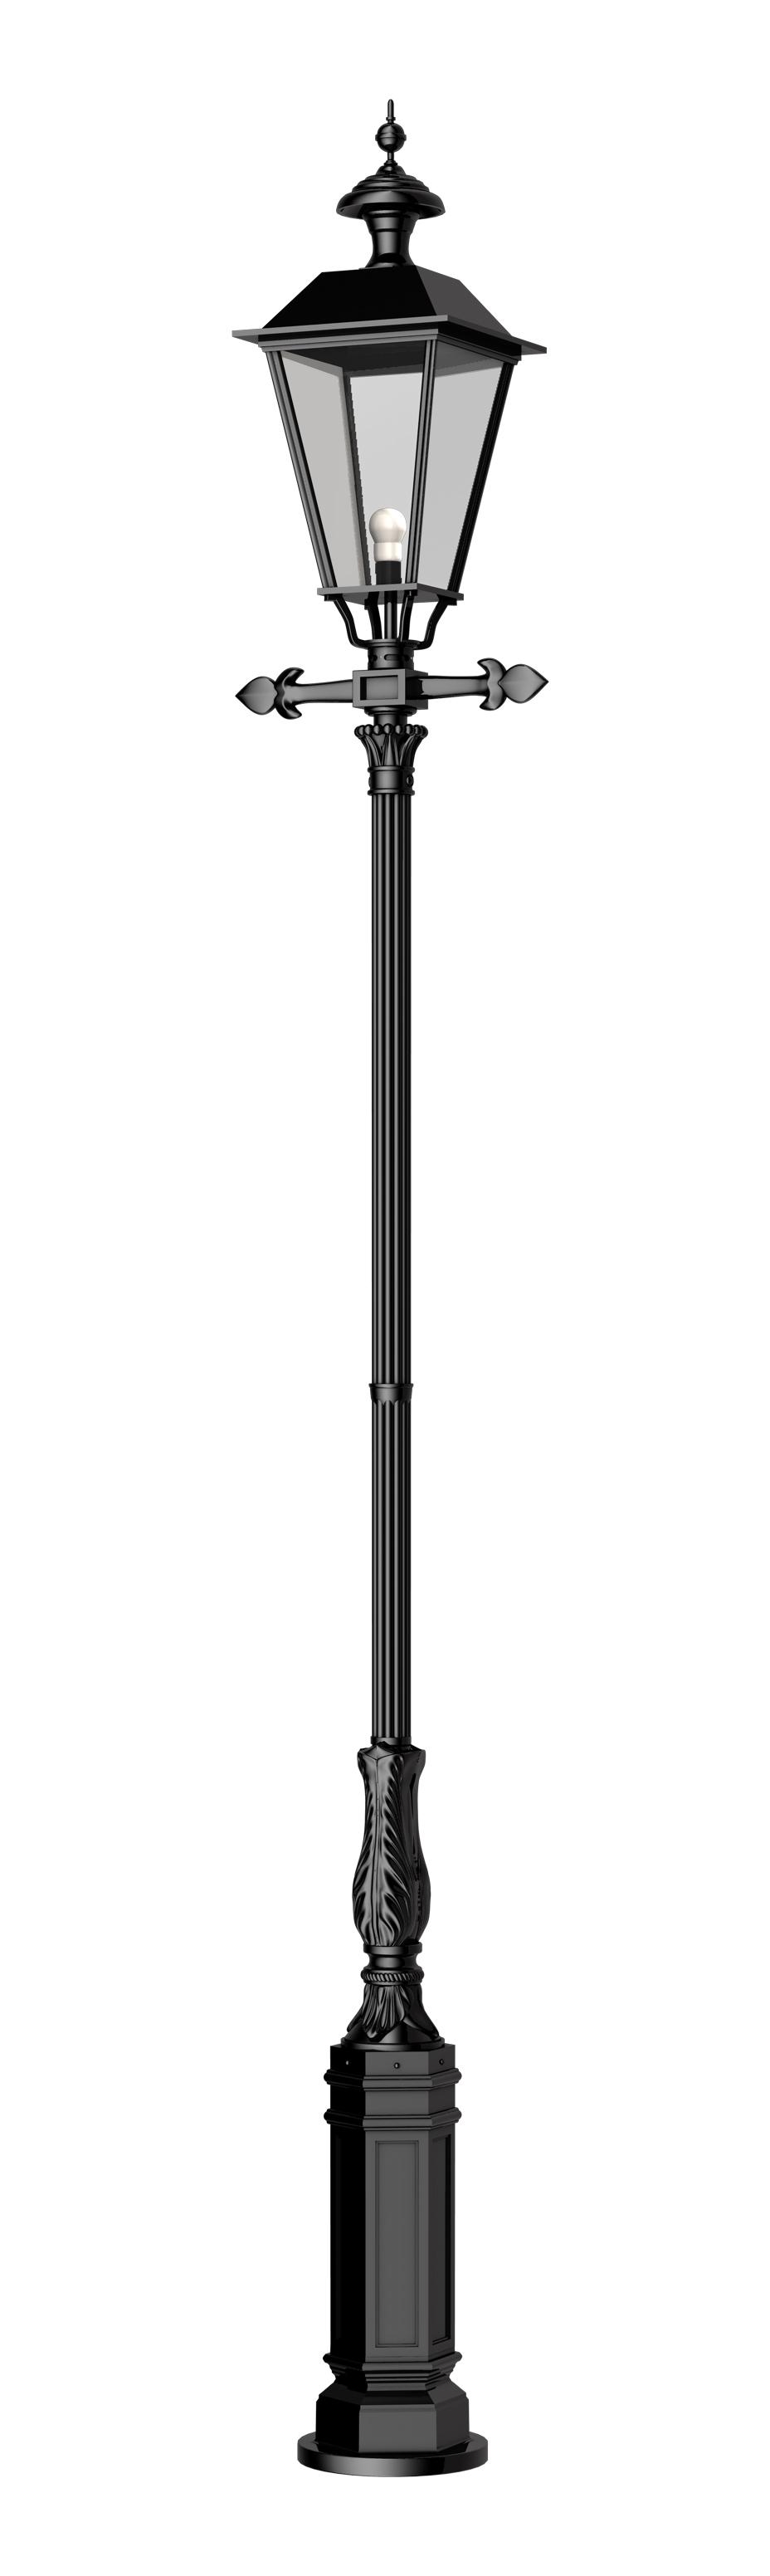 70-1623-370